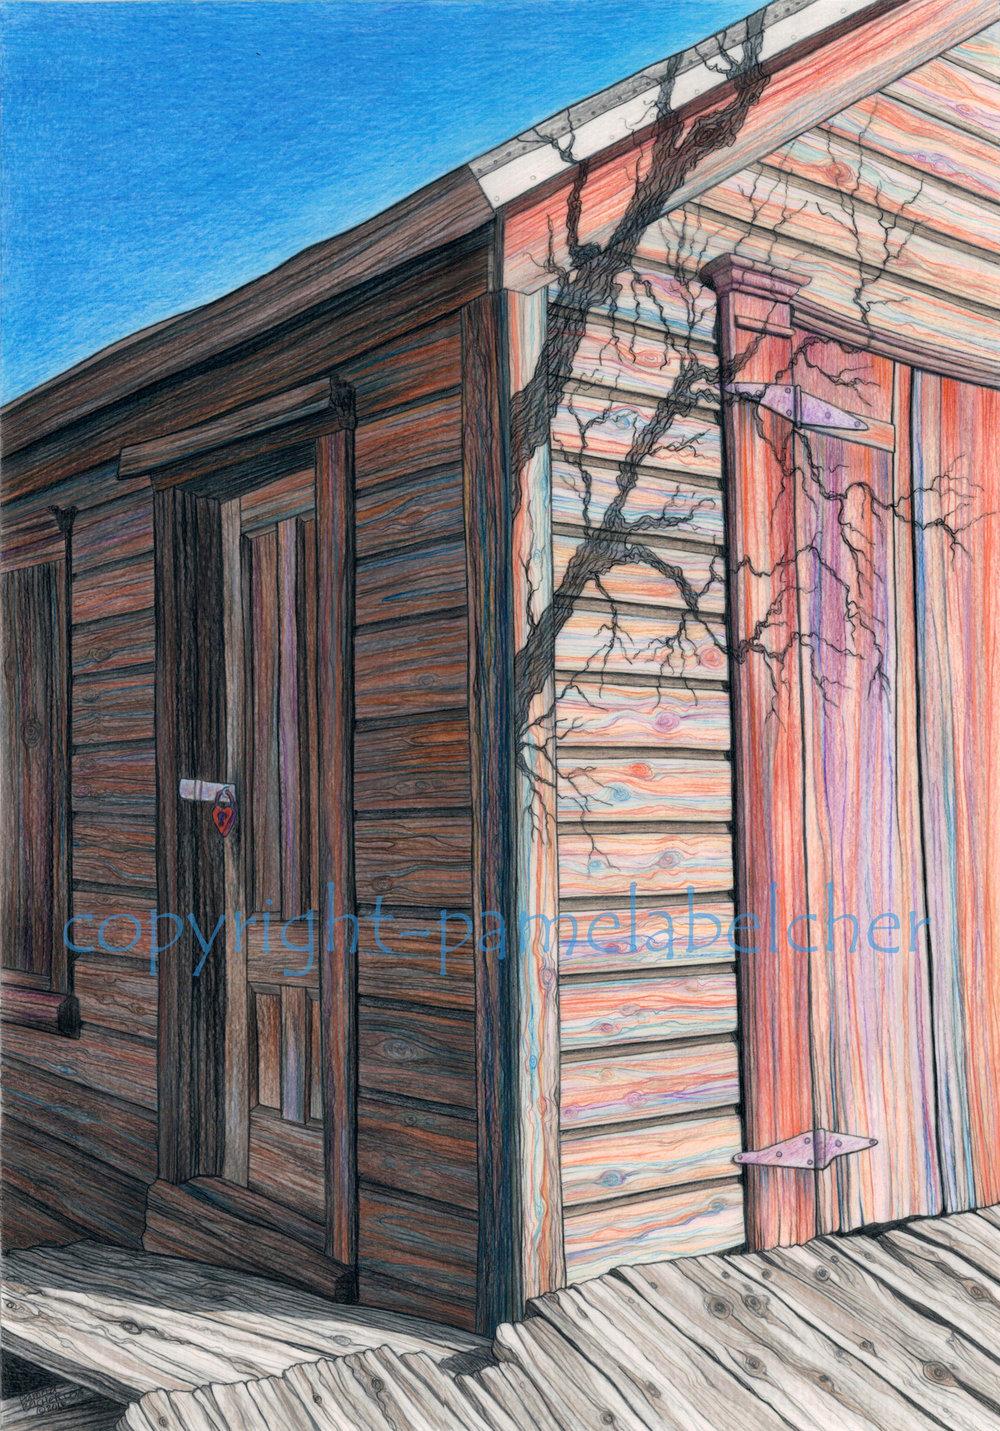 Virginia's Treehouse